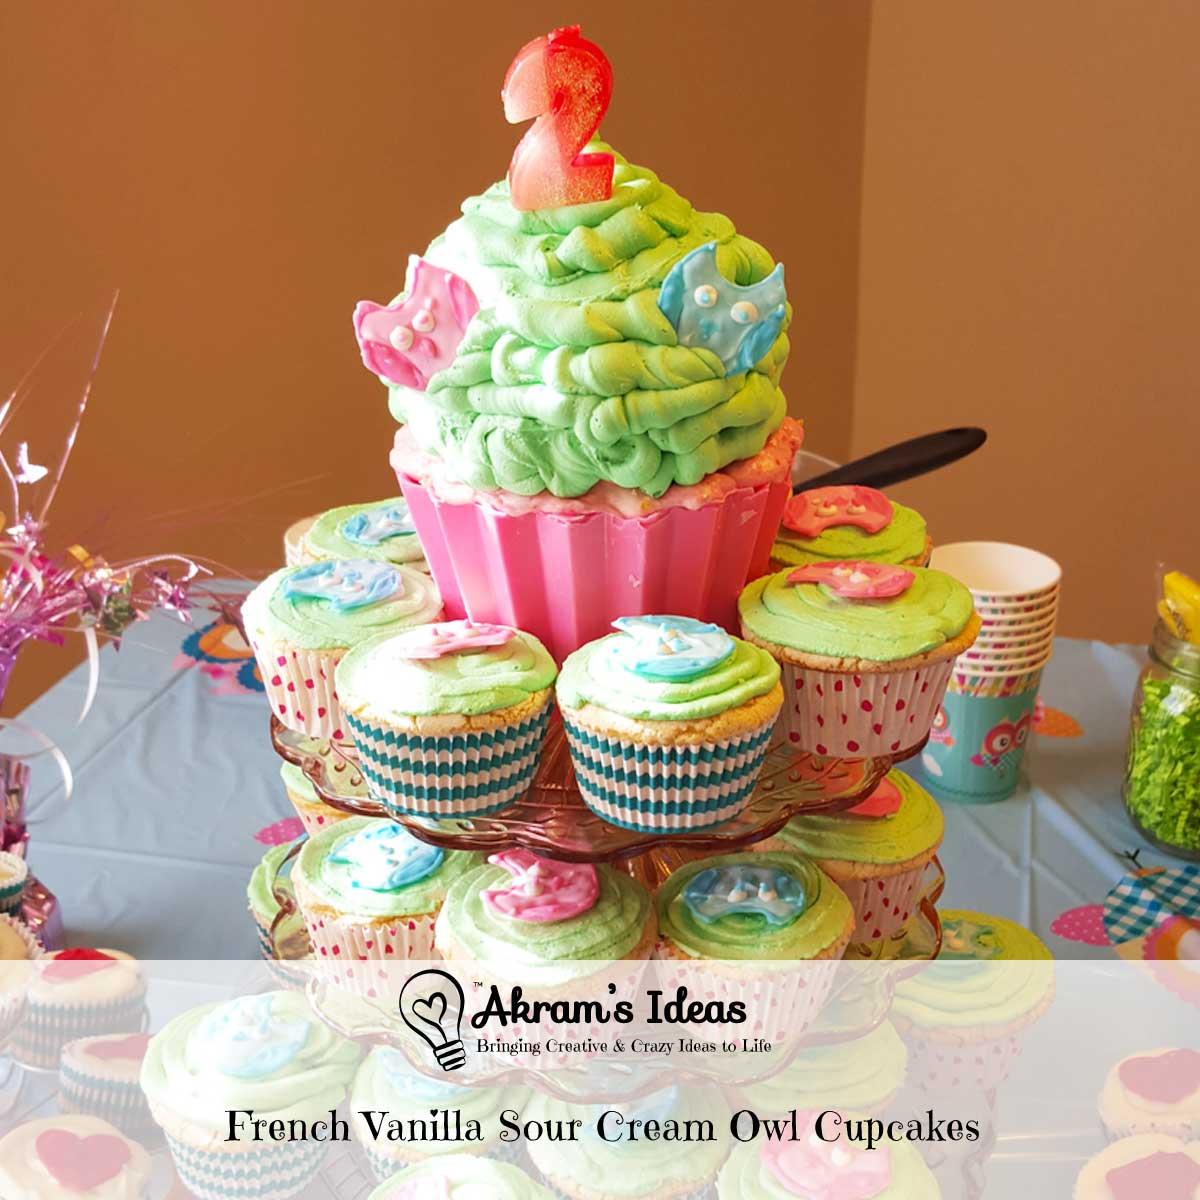 French Vanilla Sour Cream Owl Cupcakes